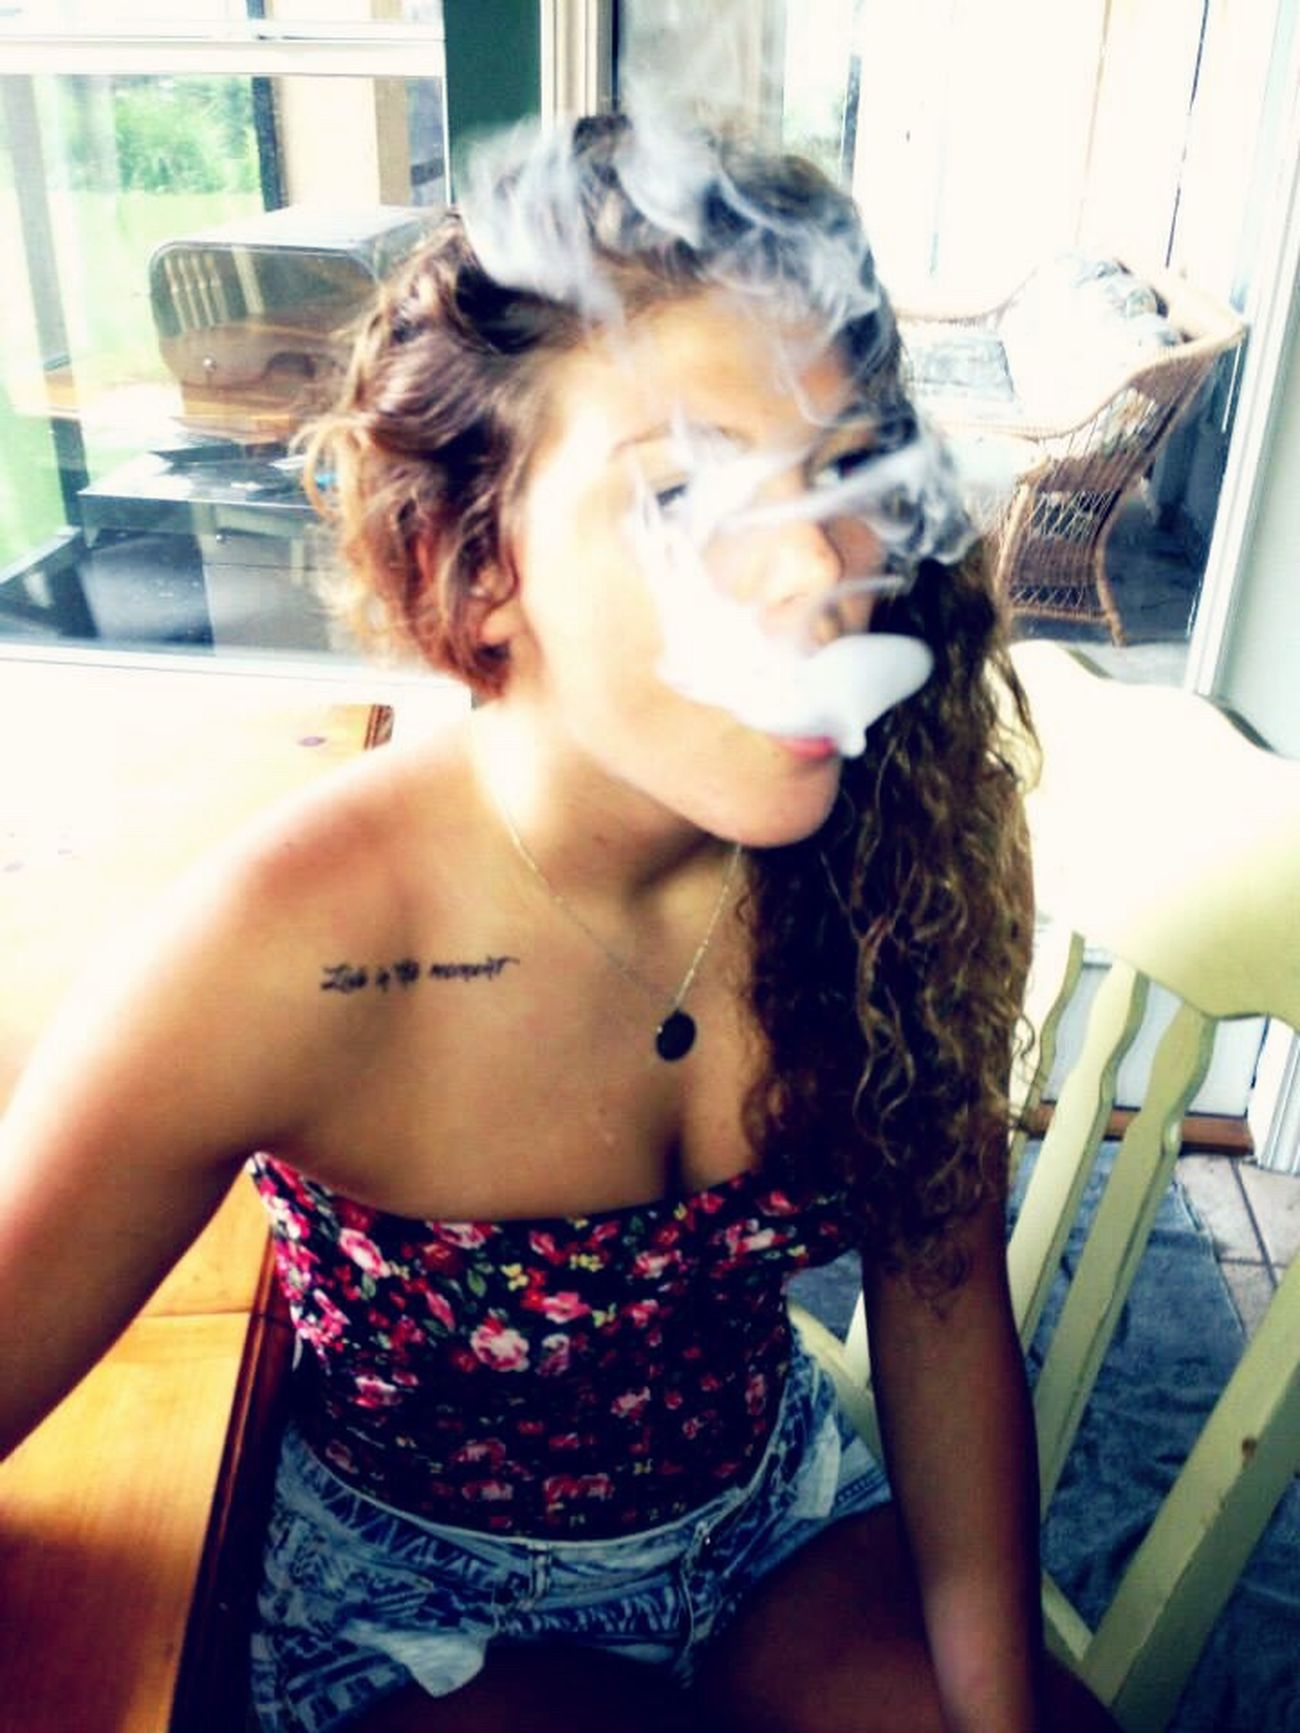 Smoke Hookah Blowinsmoke  EyeEmNewHere